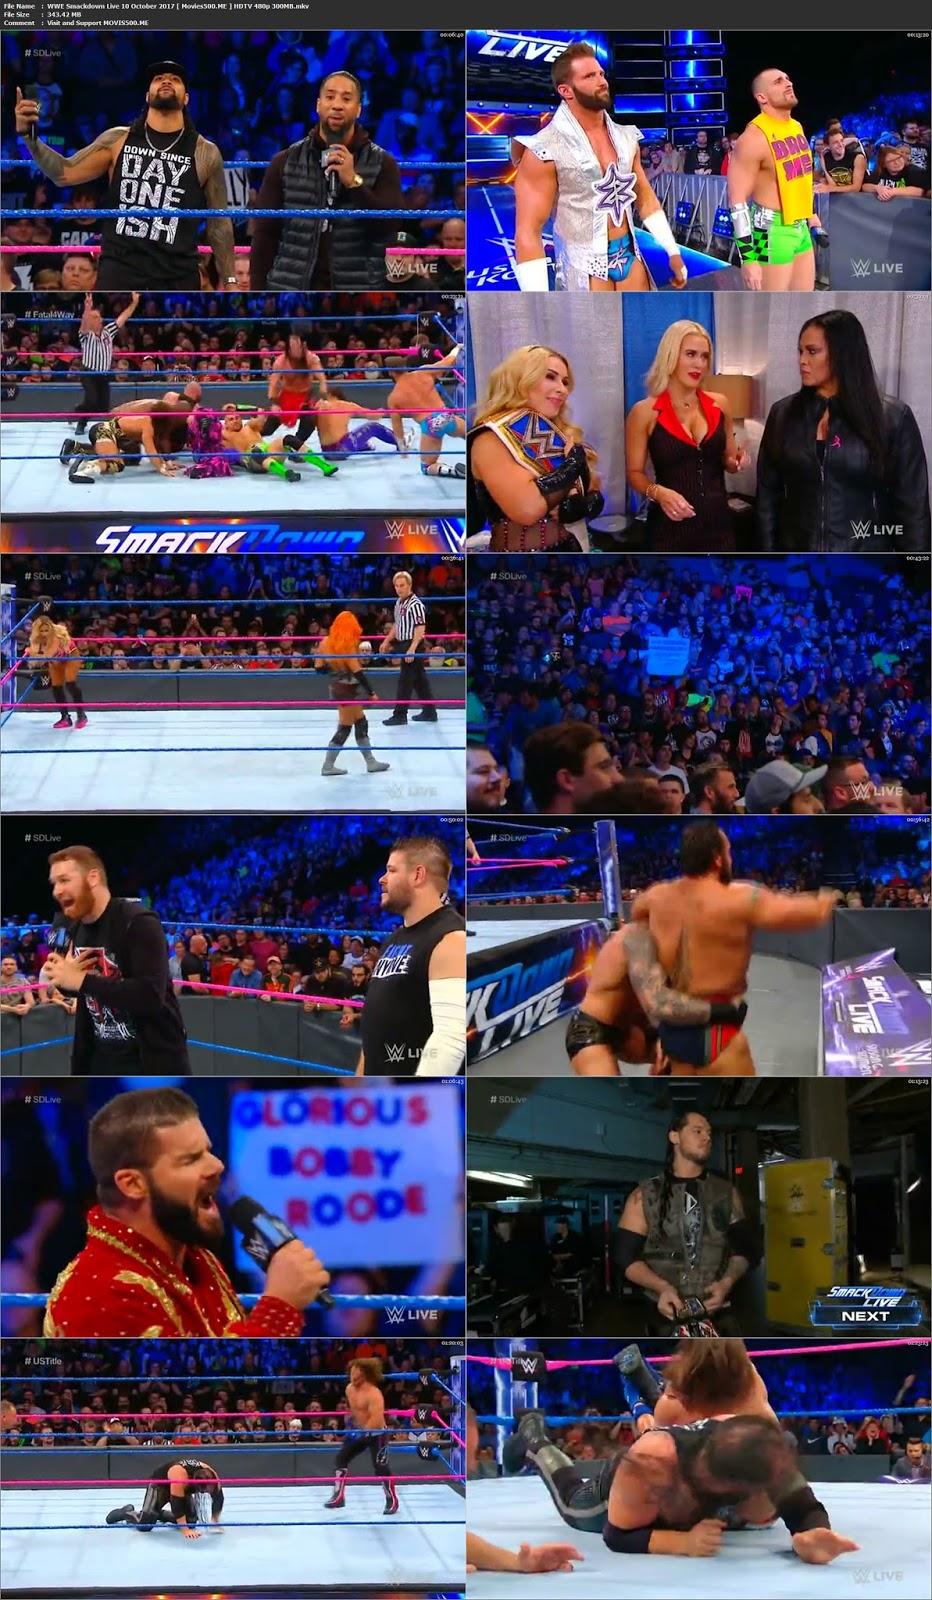 WWE Smackdown Live 10 October 2017 HDTV 343MB Download 480p at freedomcopy.com